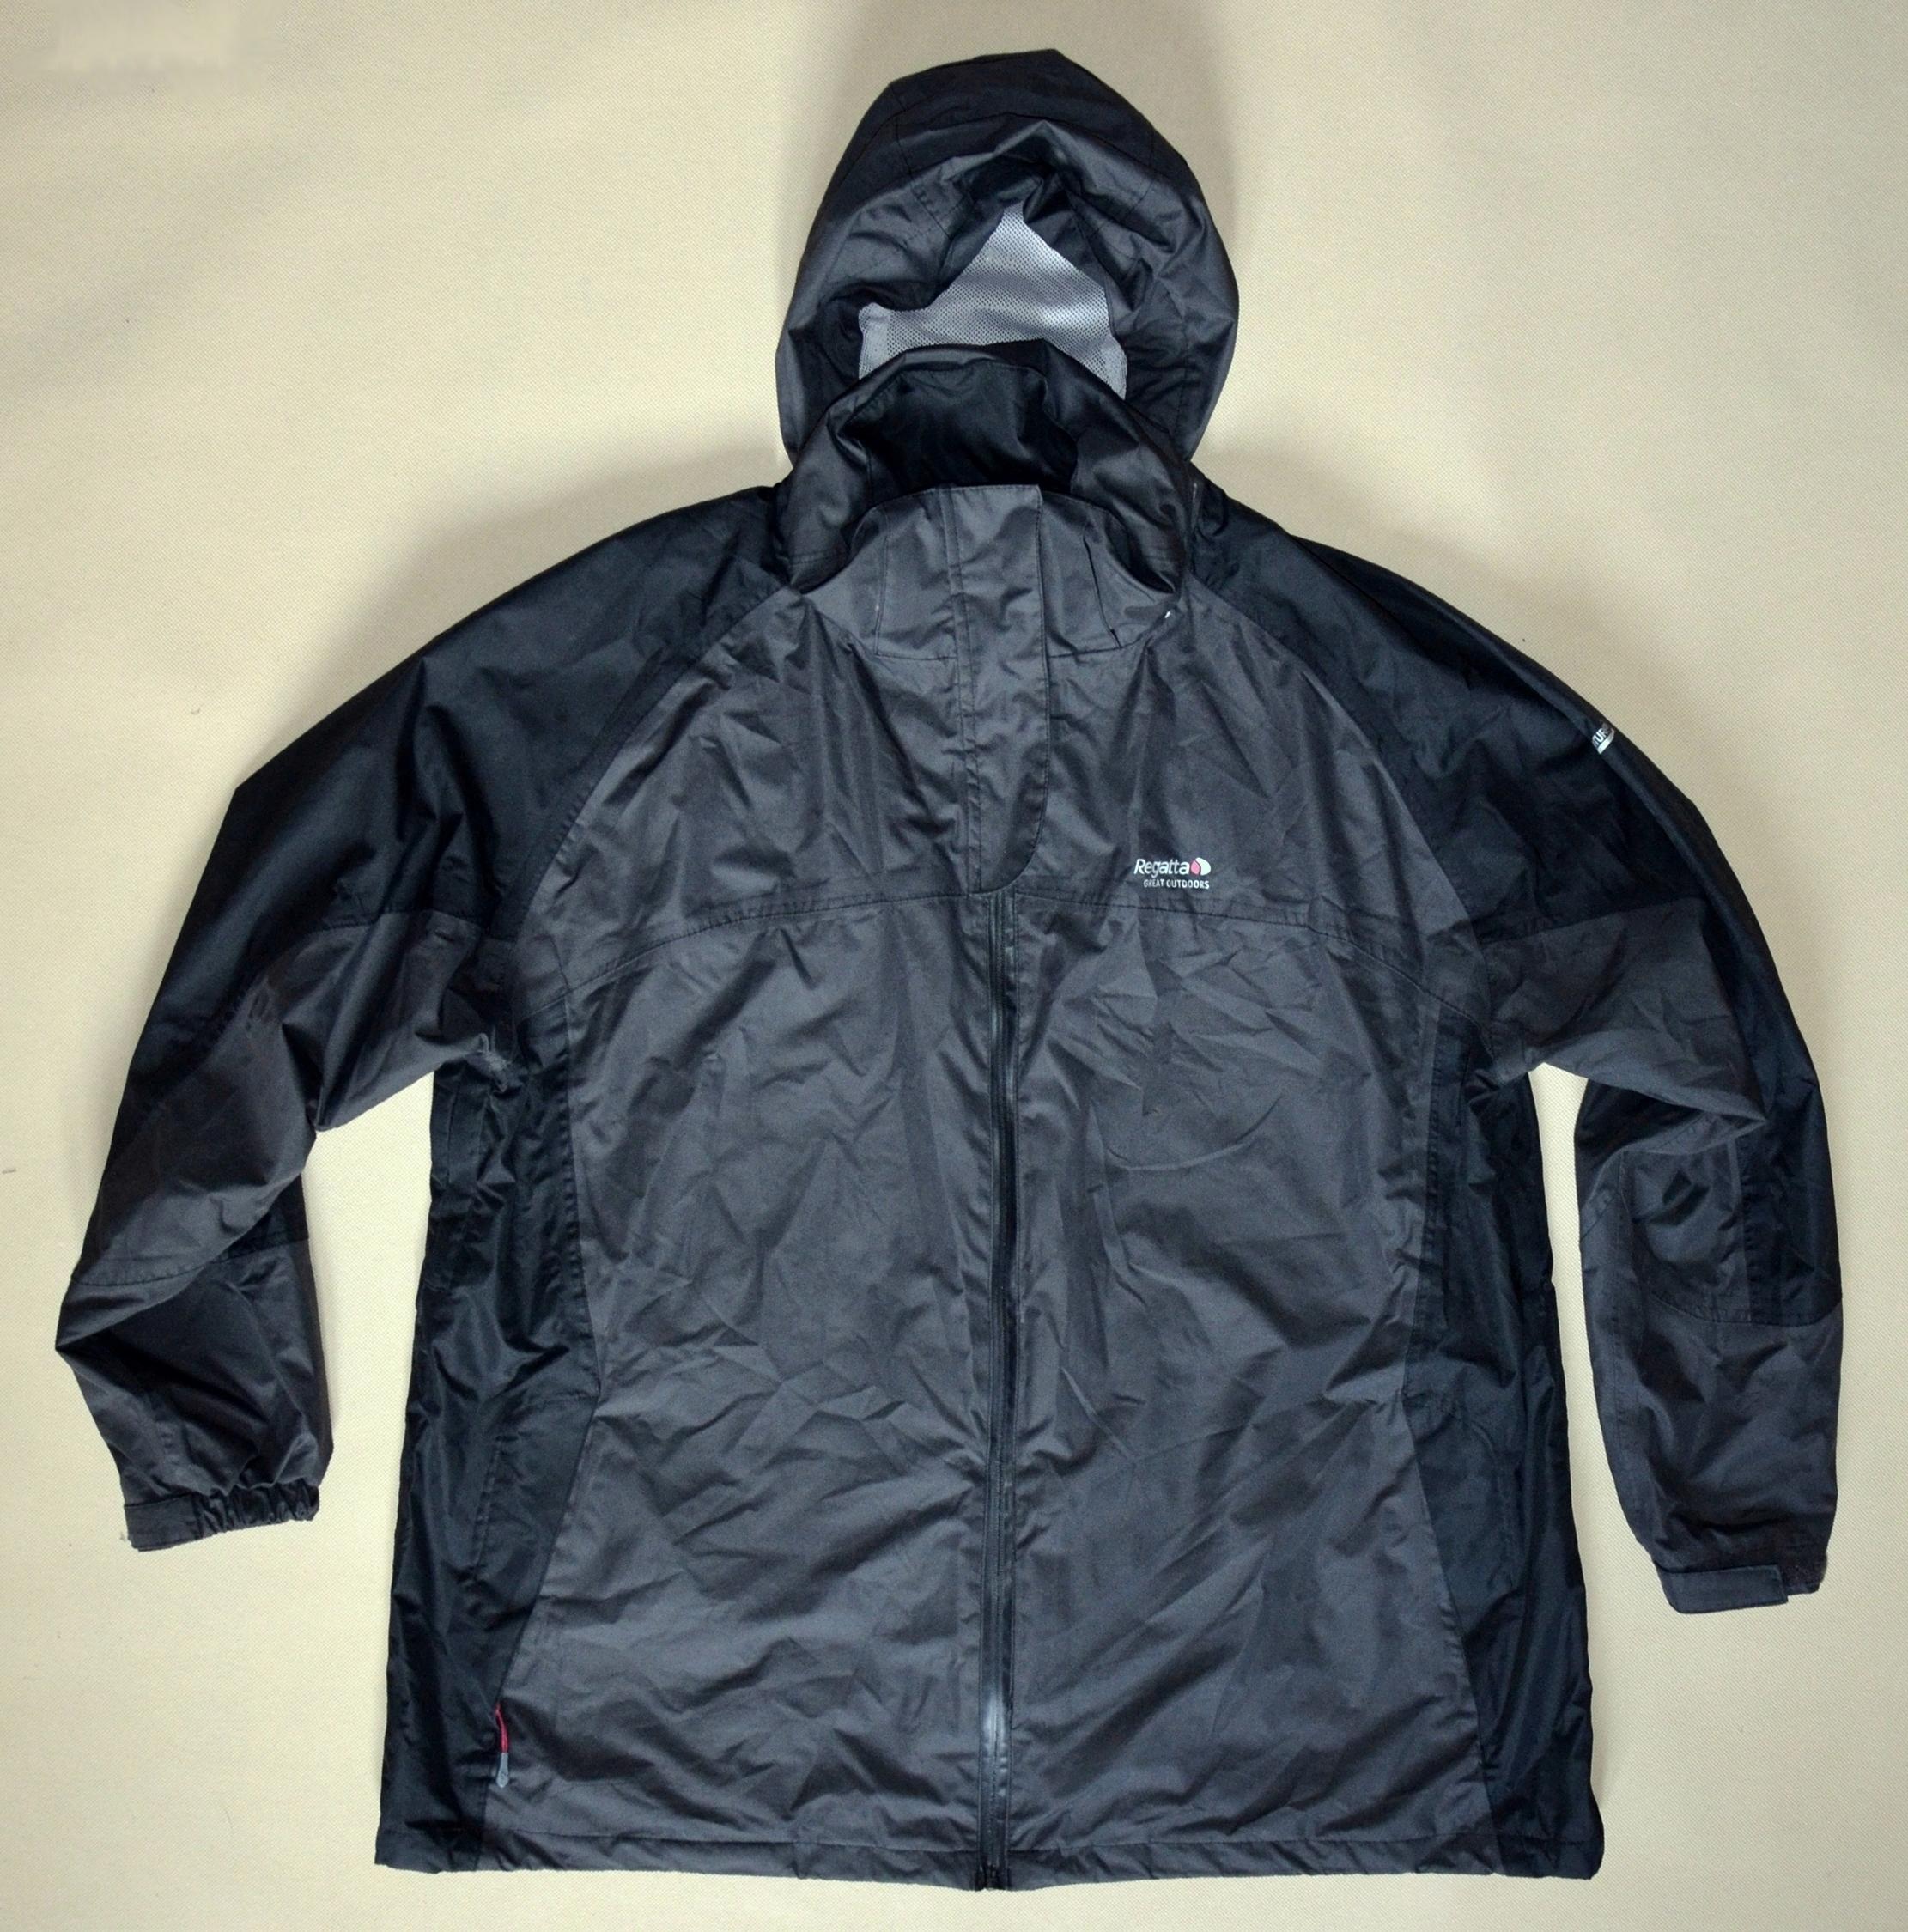 REGATTA ADVENTURE kurtka outdoor ISOTEX rozmiar 50